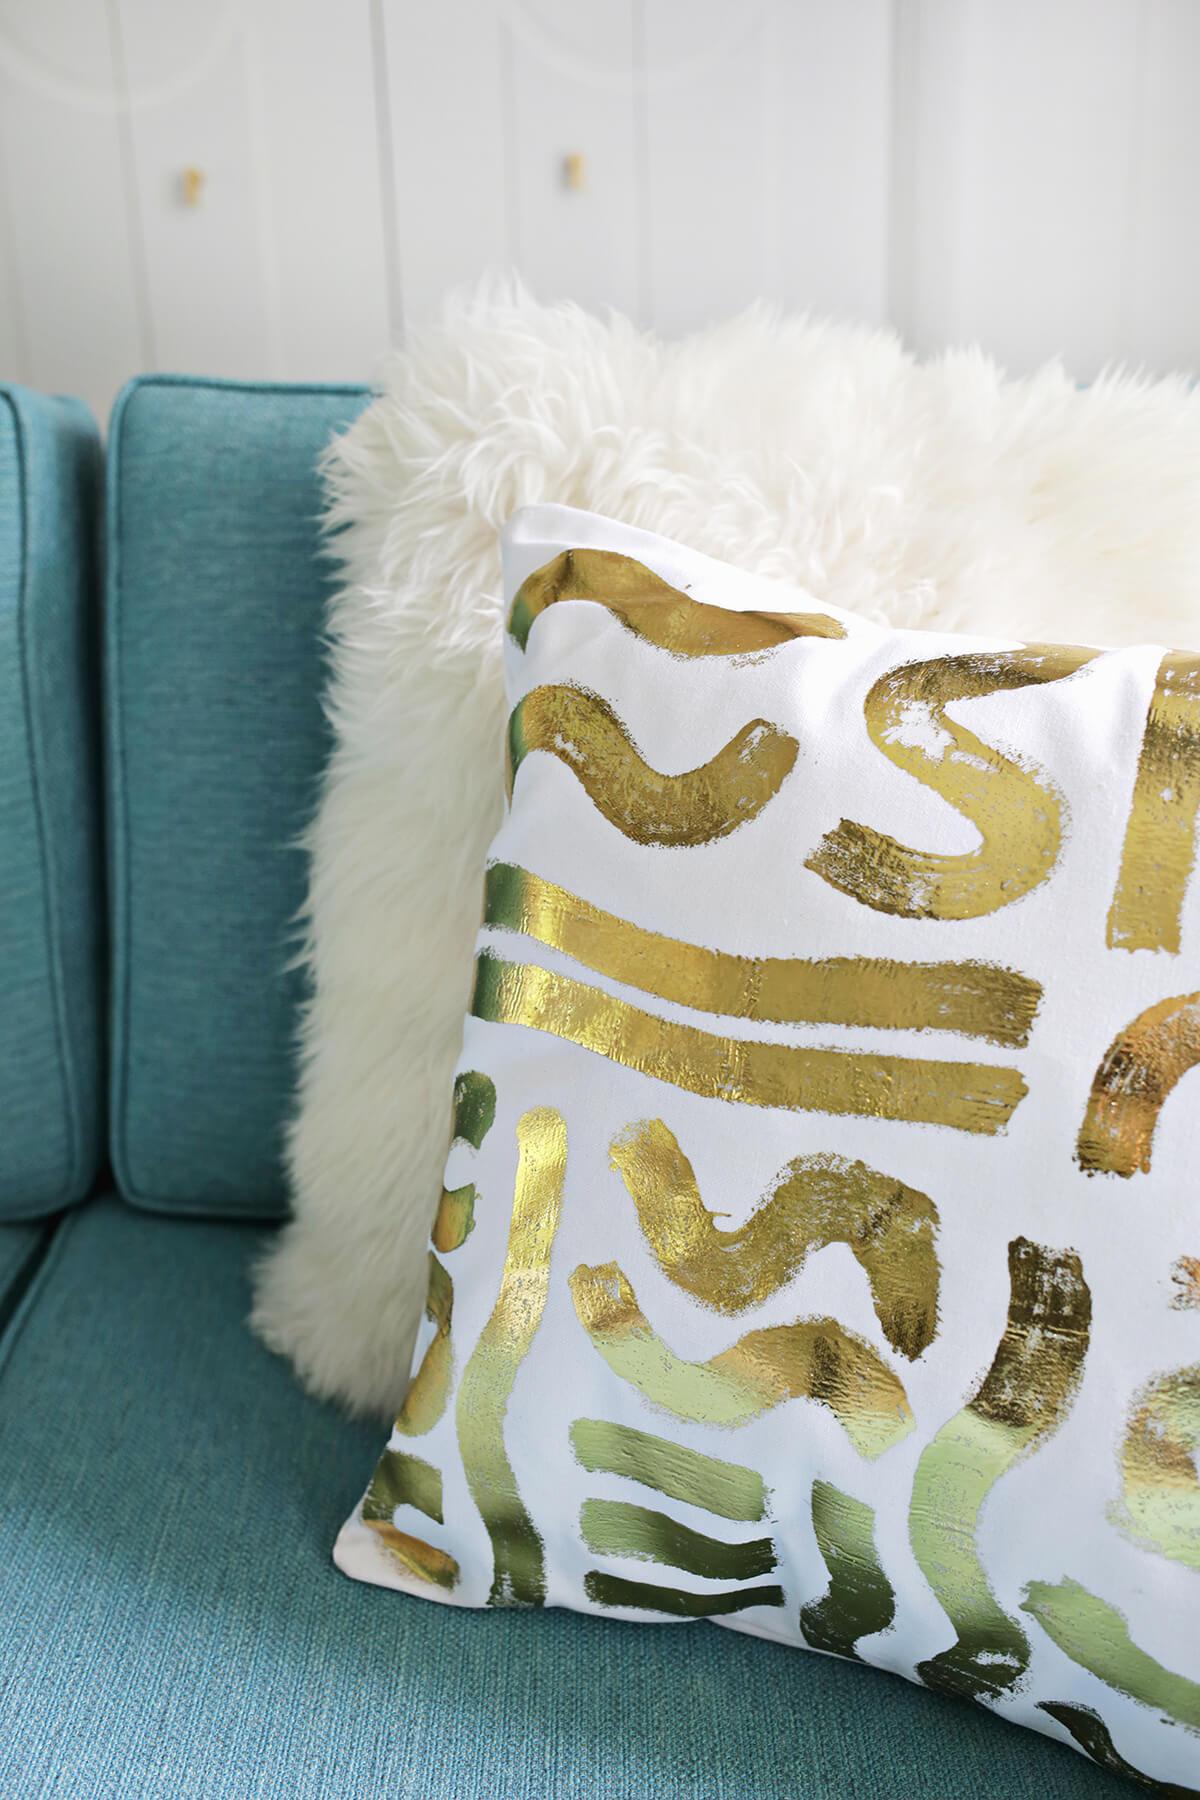 DIY Metallic Paint Patterned Pillow